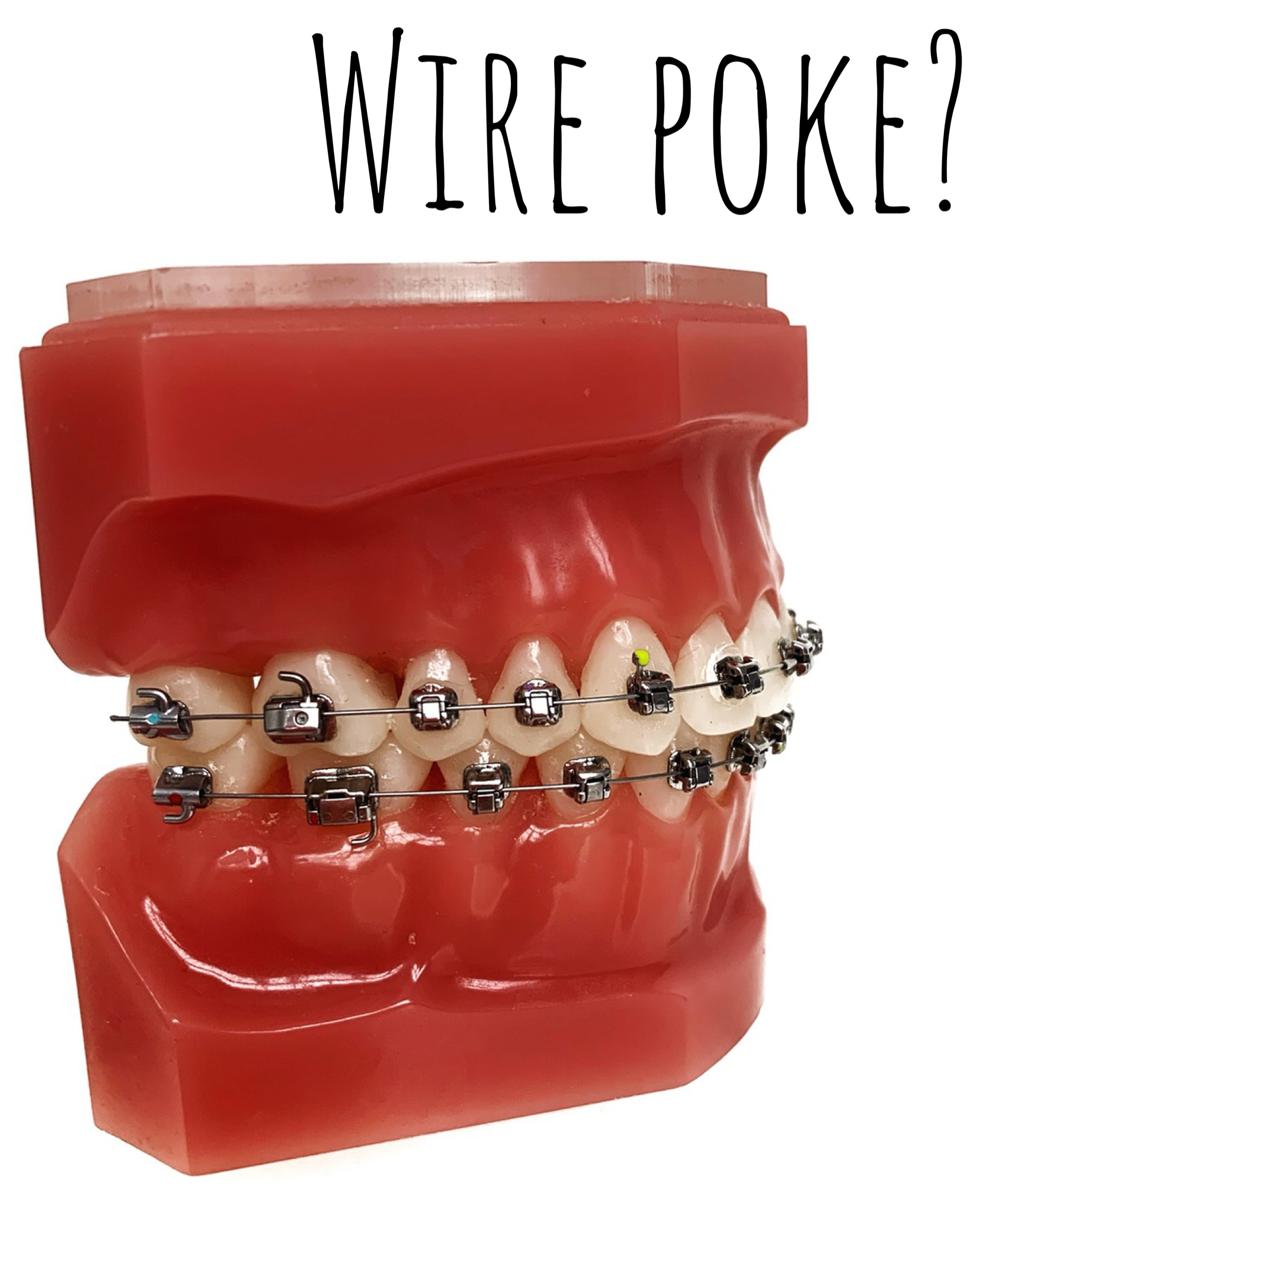 Wire Poke?